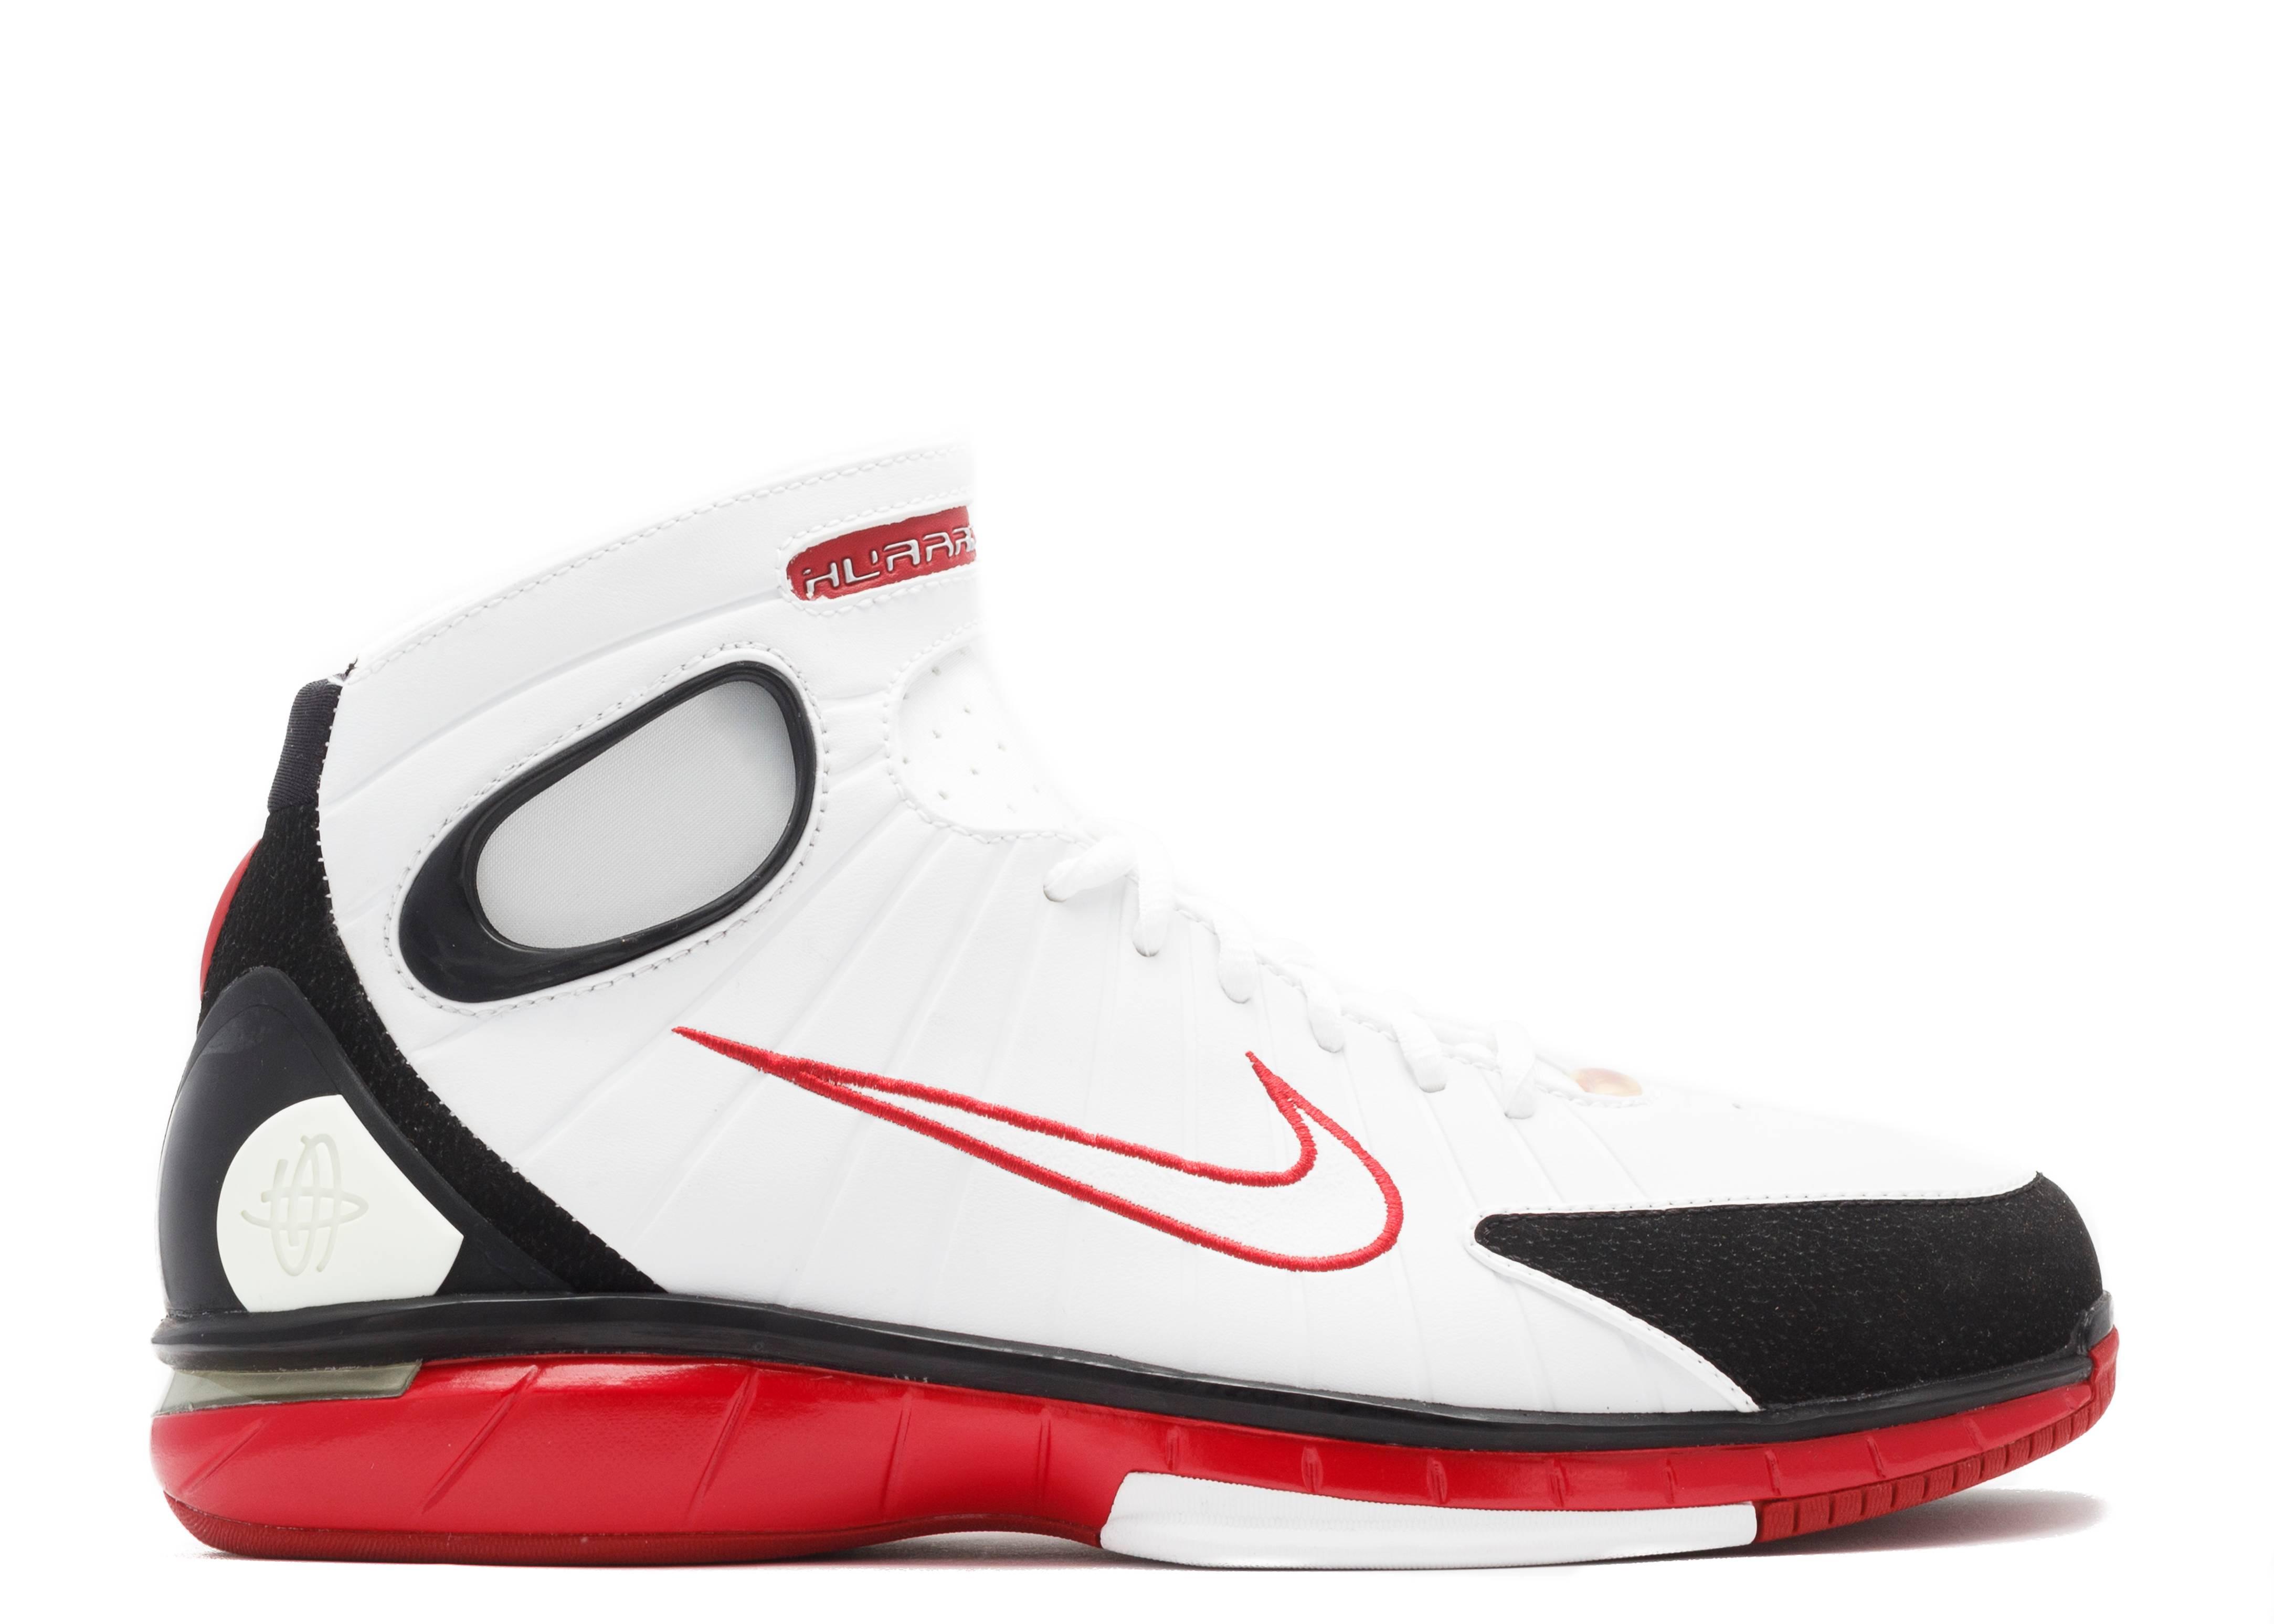 new arrival c86f5 ea854 Air Zoom Huarache 2k4 - Nike - 308475 111 - white white-varsity red-black    Flight Club